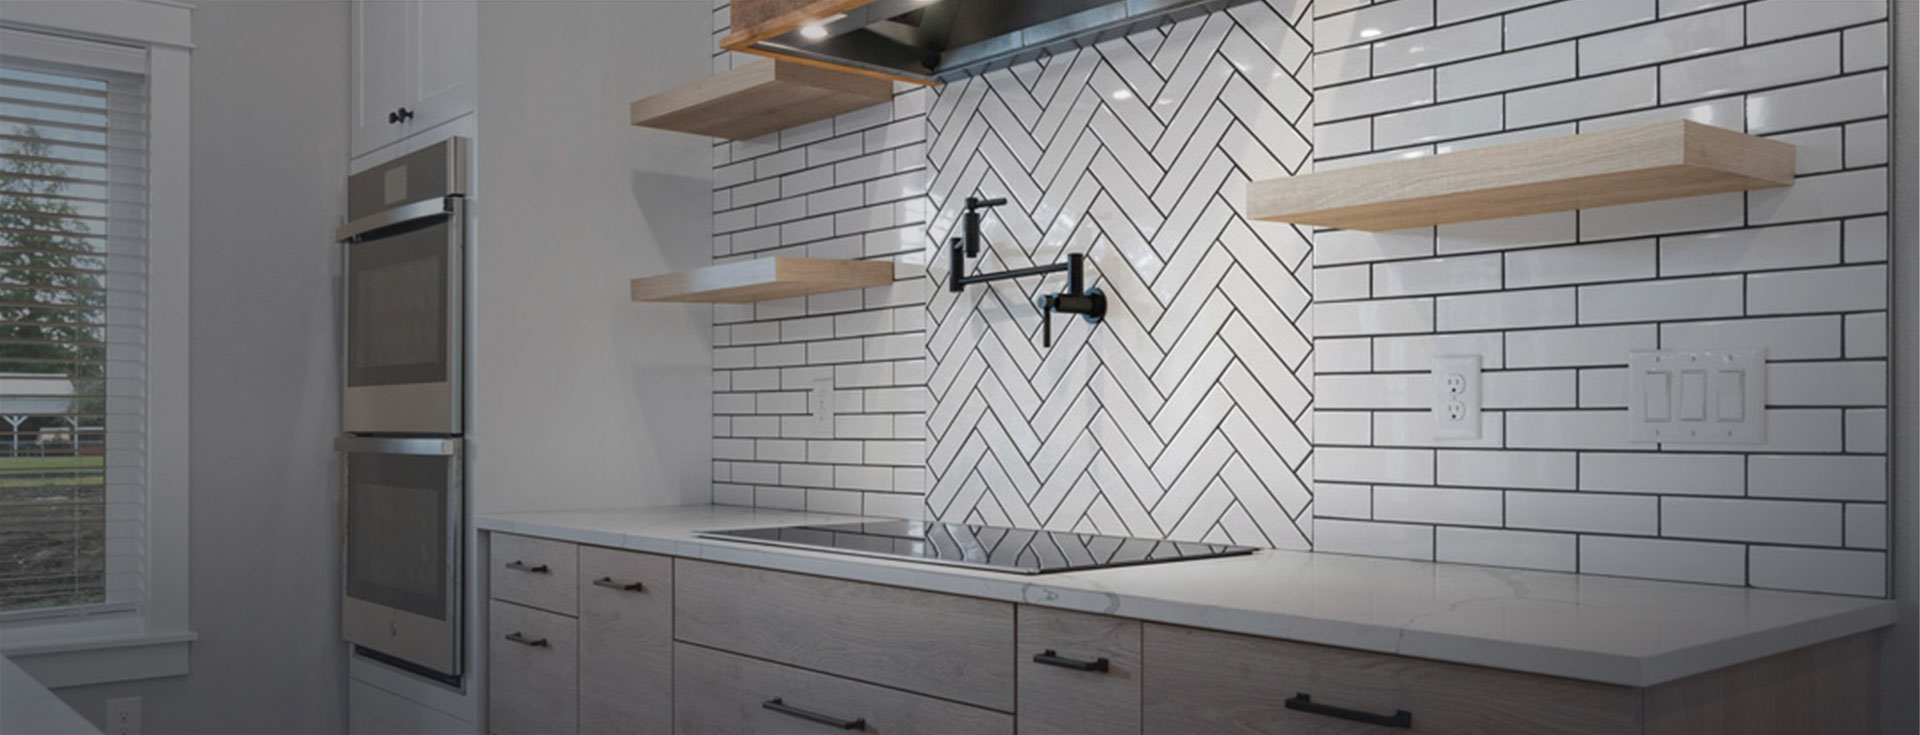 Stillwell Home - Cabinets by Trivonna